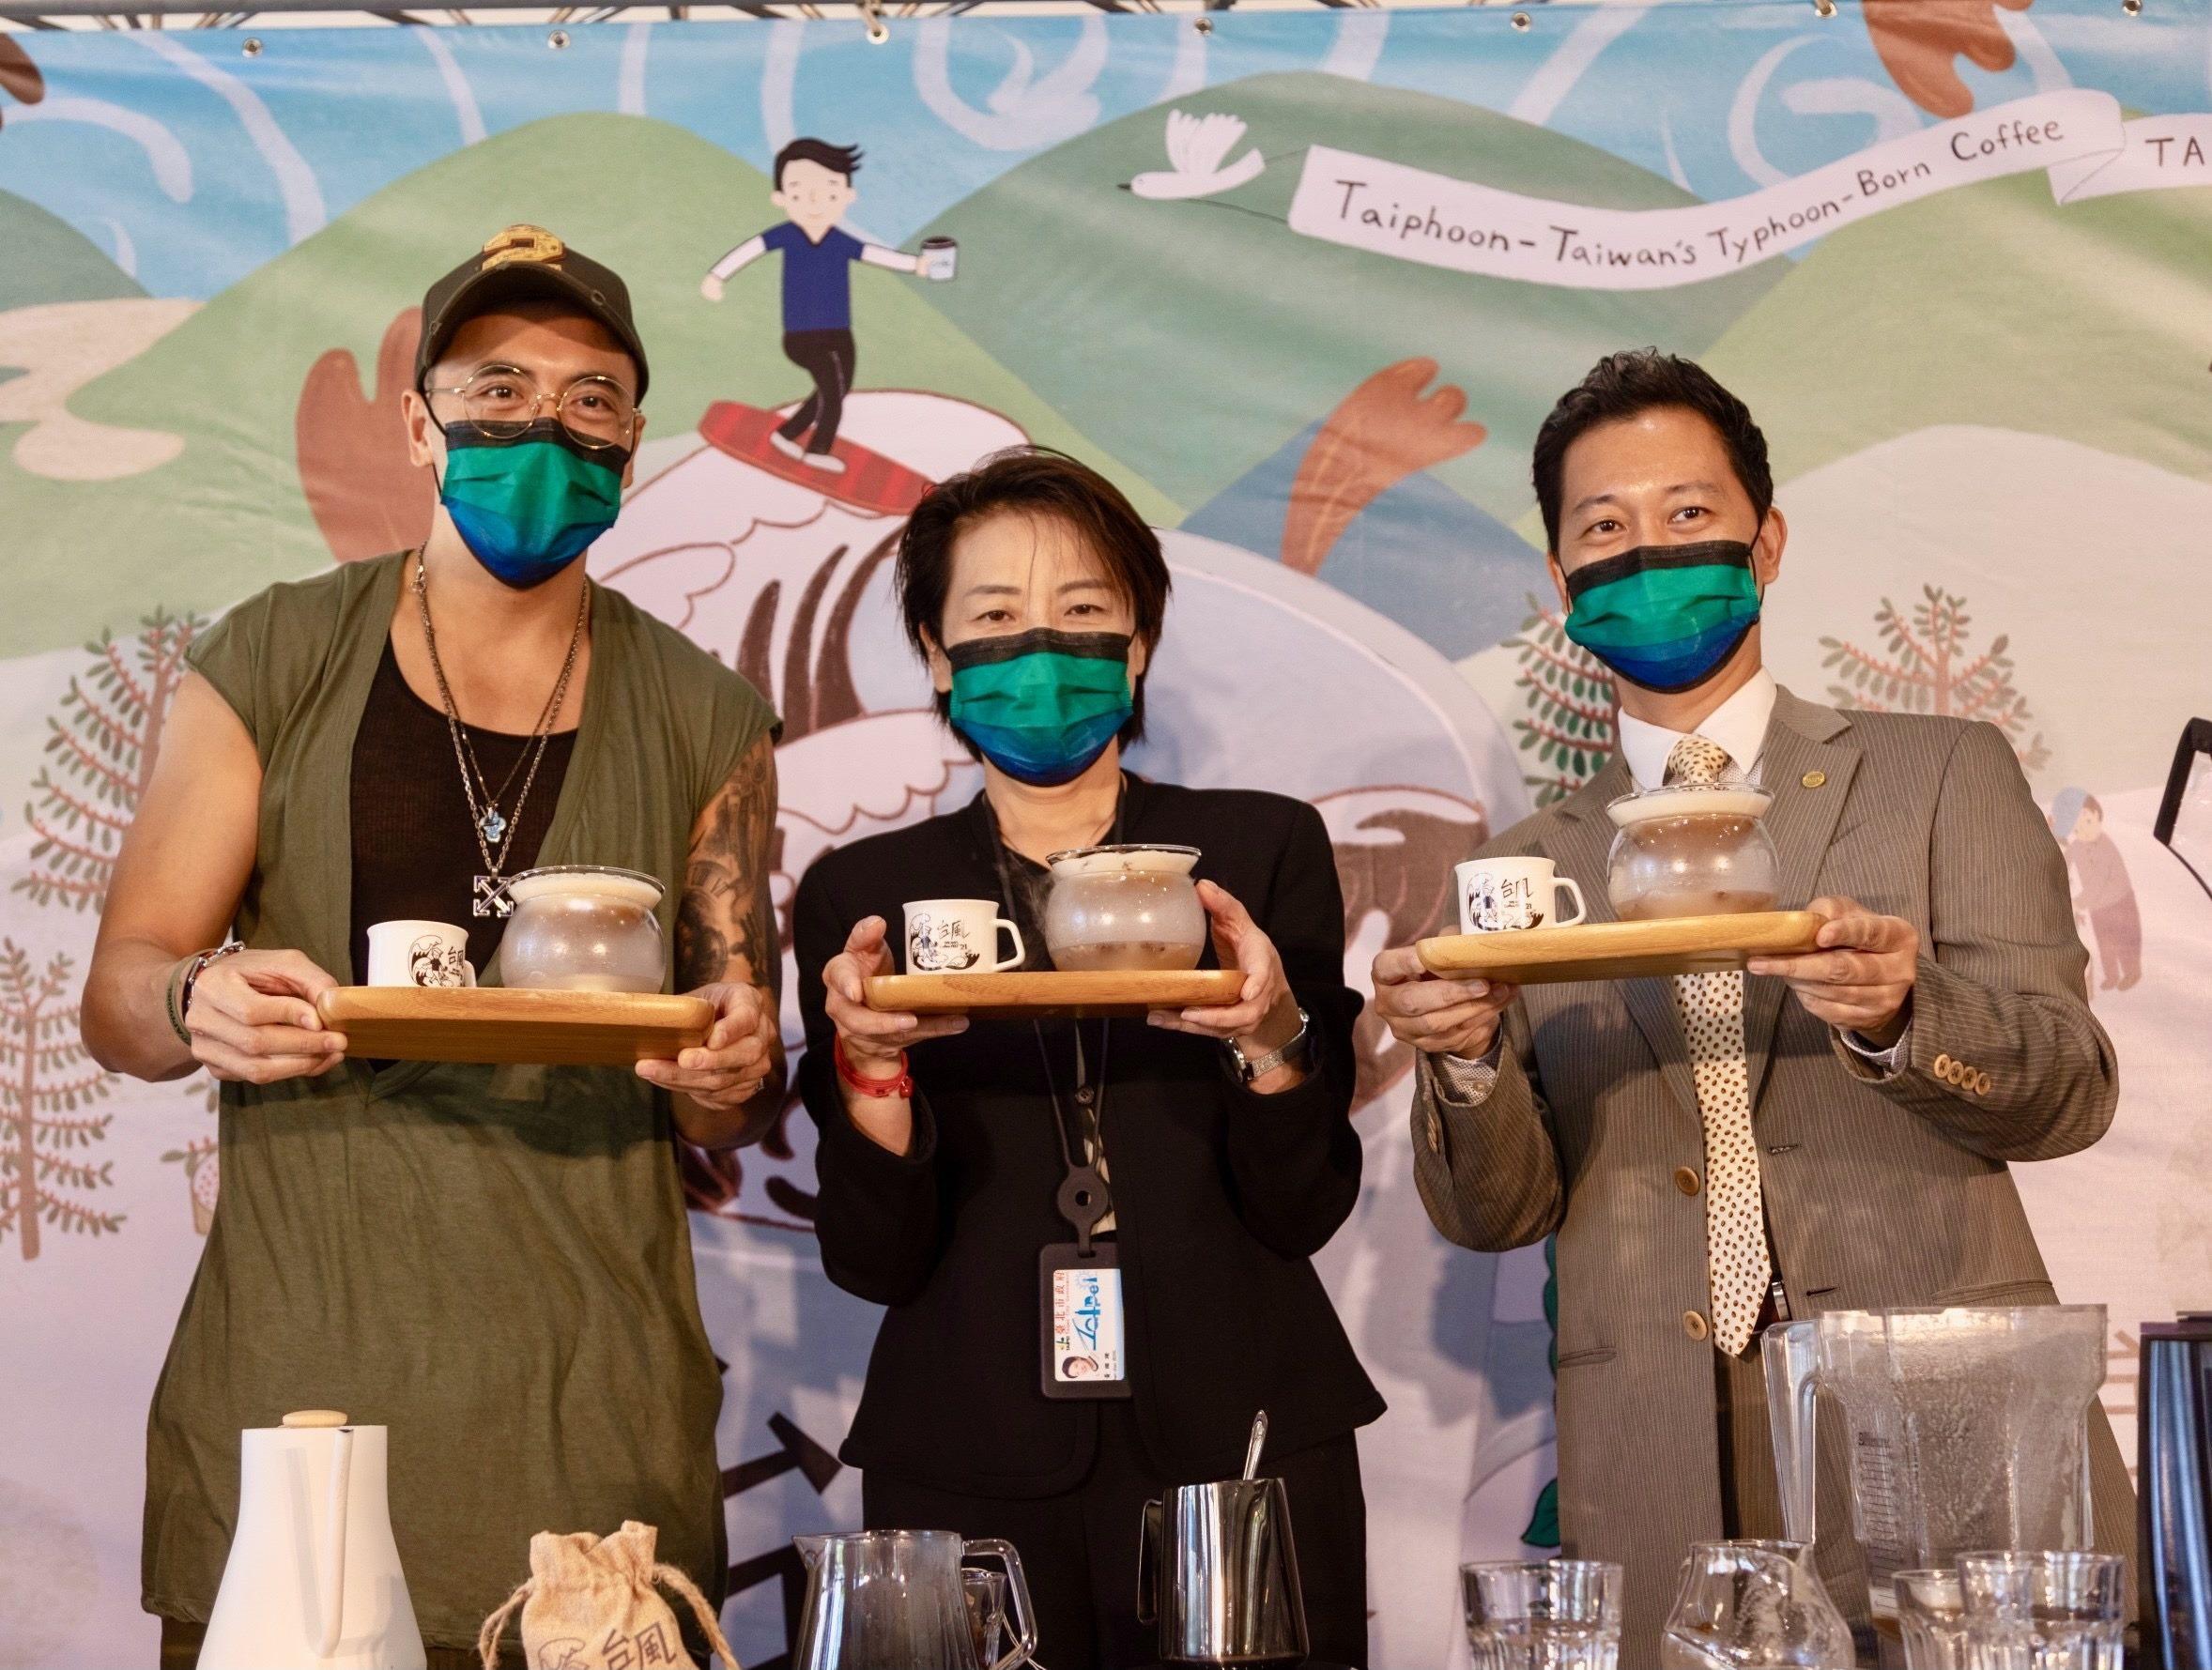 Deputy Mayor Kicks-off 2021 Taipei International Coffee Fest